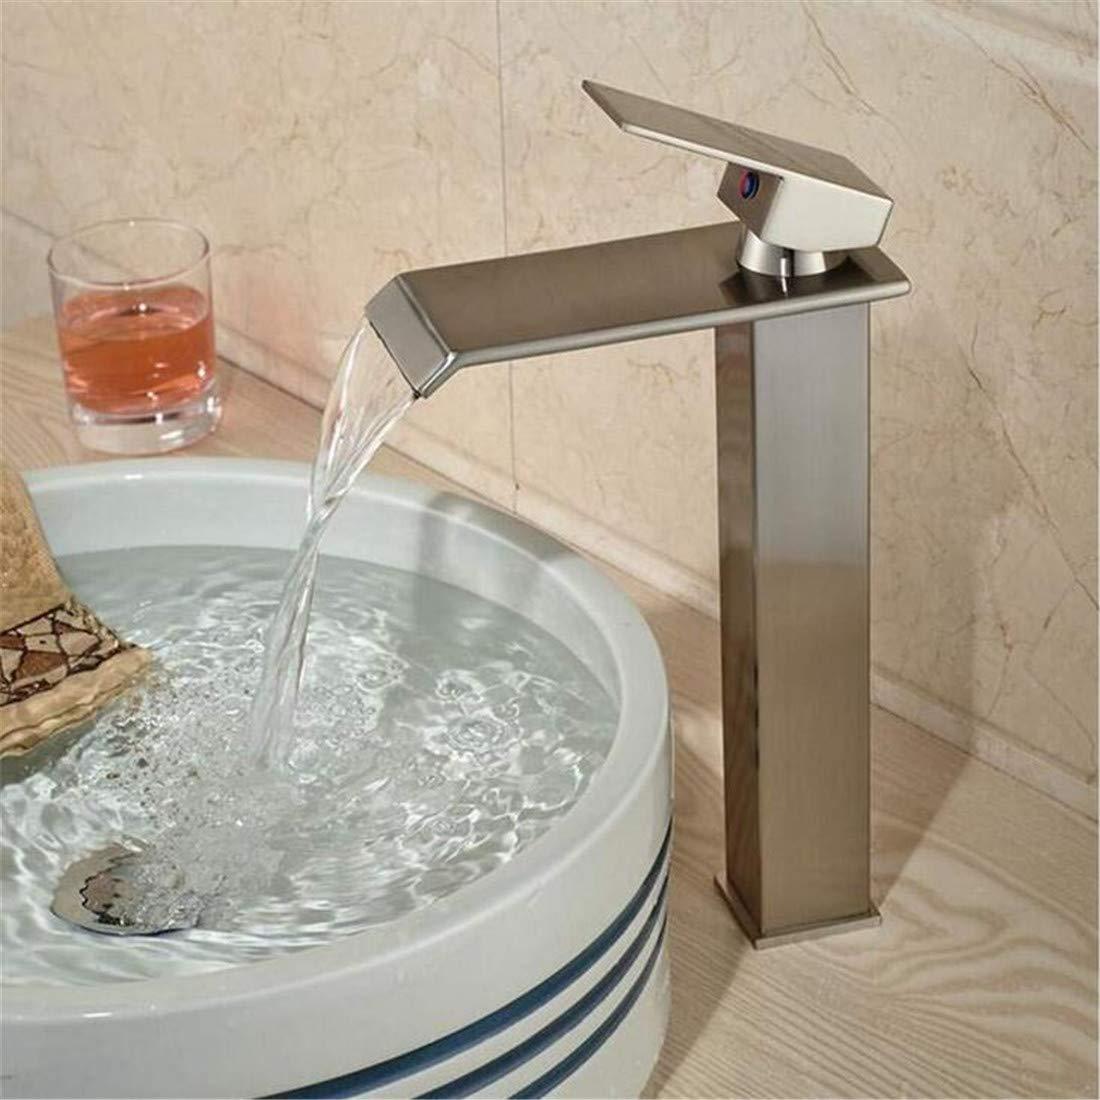 Kitchen Bath Basin Sink Bathroom Taps Washbasin Mixer Waterfall Single Handle Basin Faucet Ctzl2088